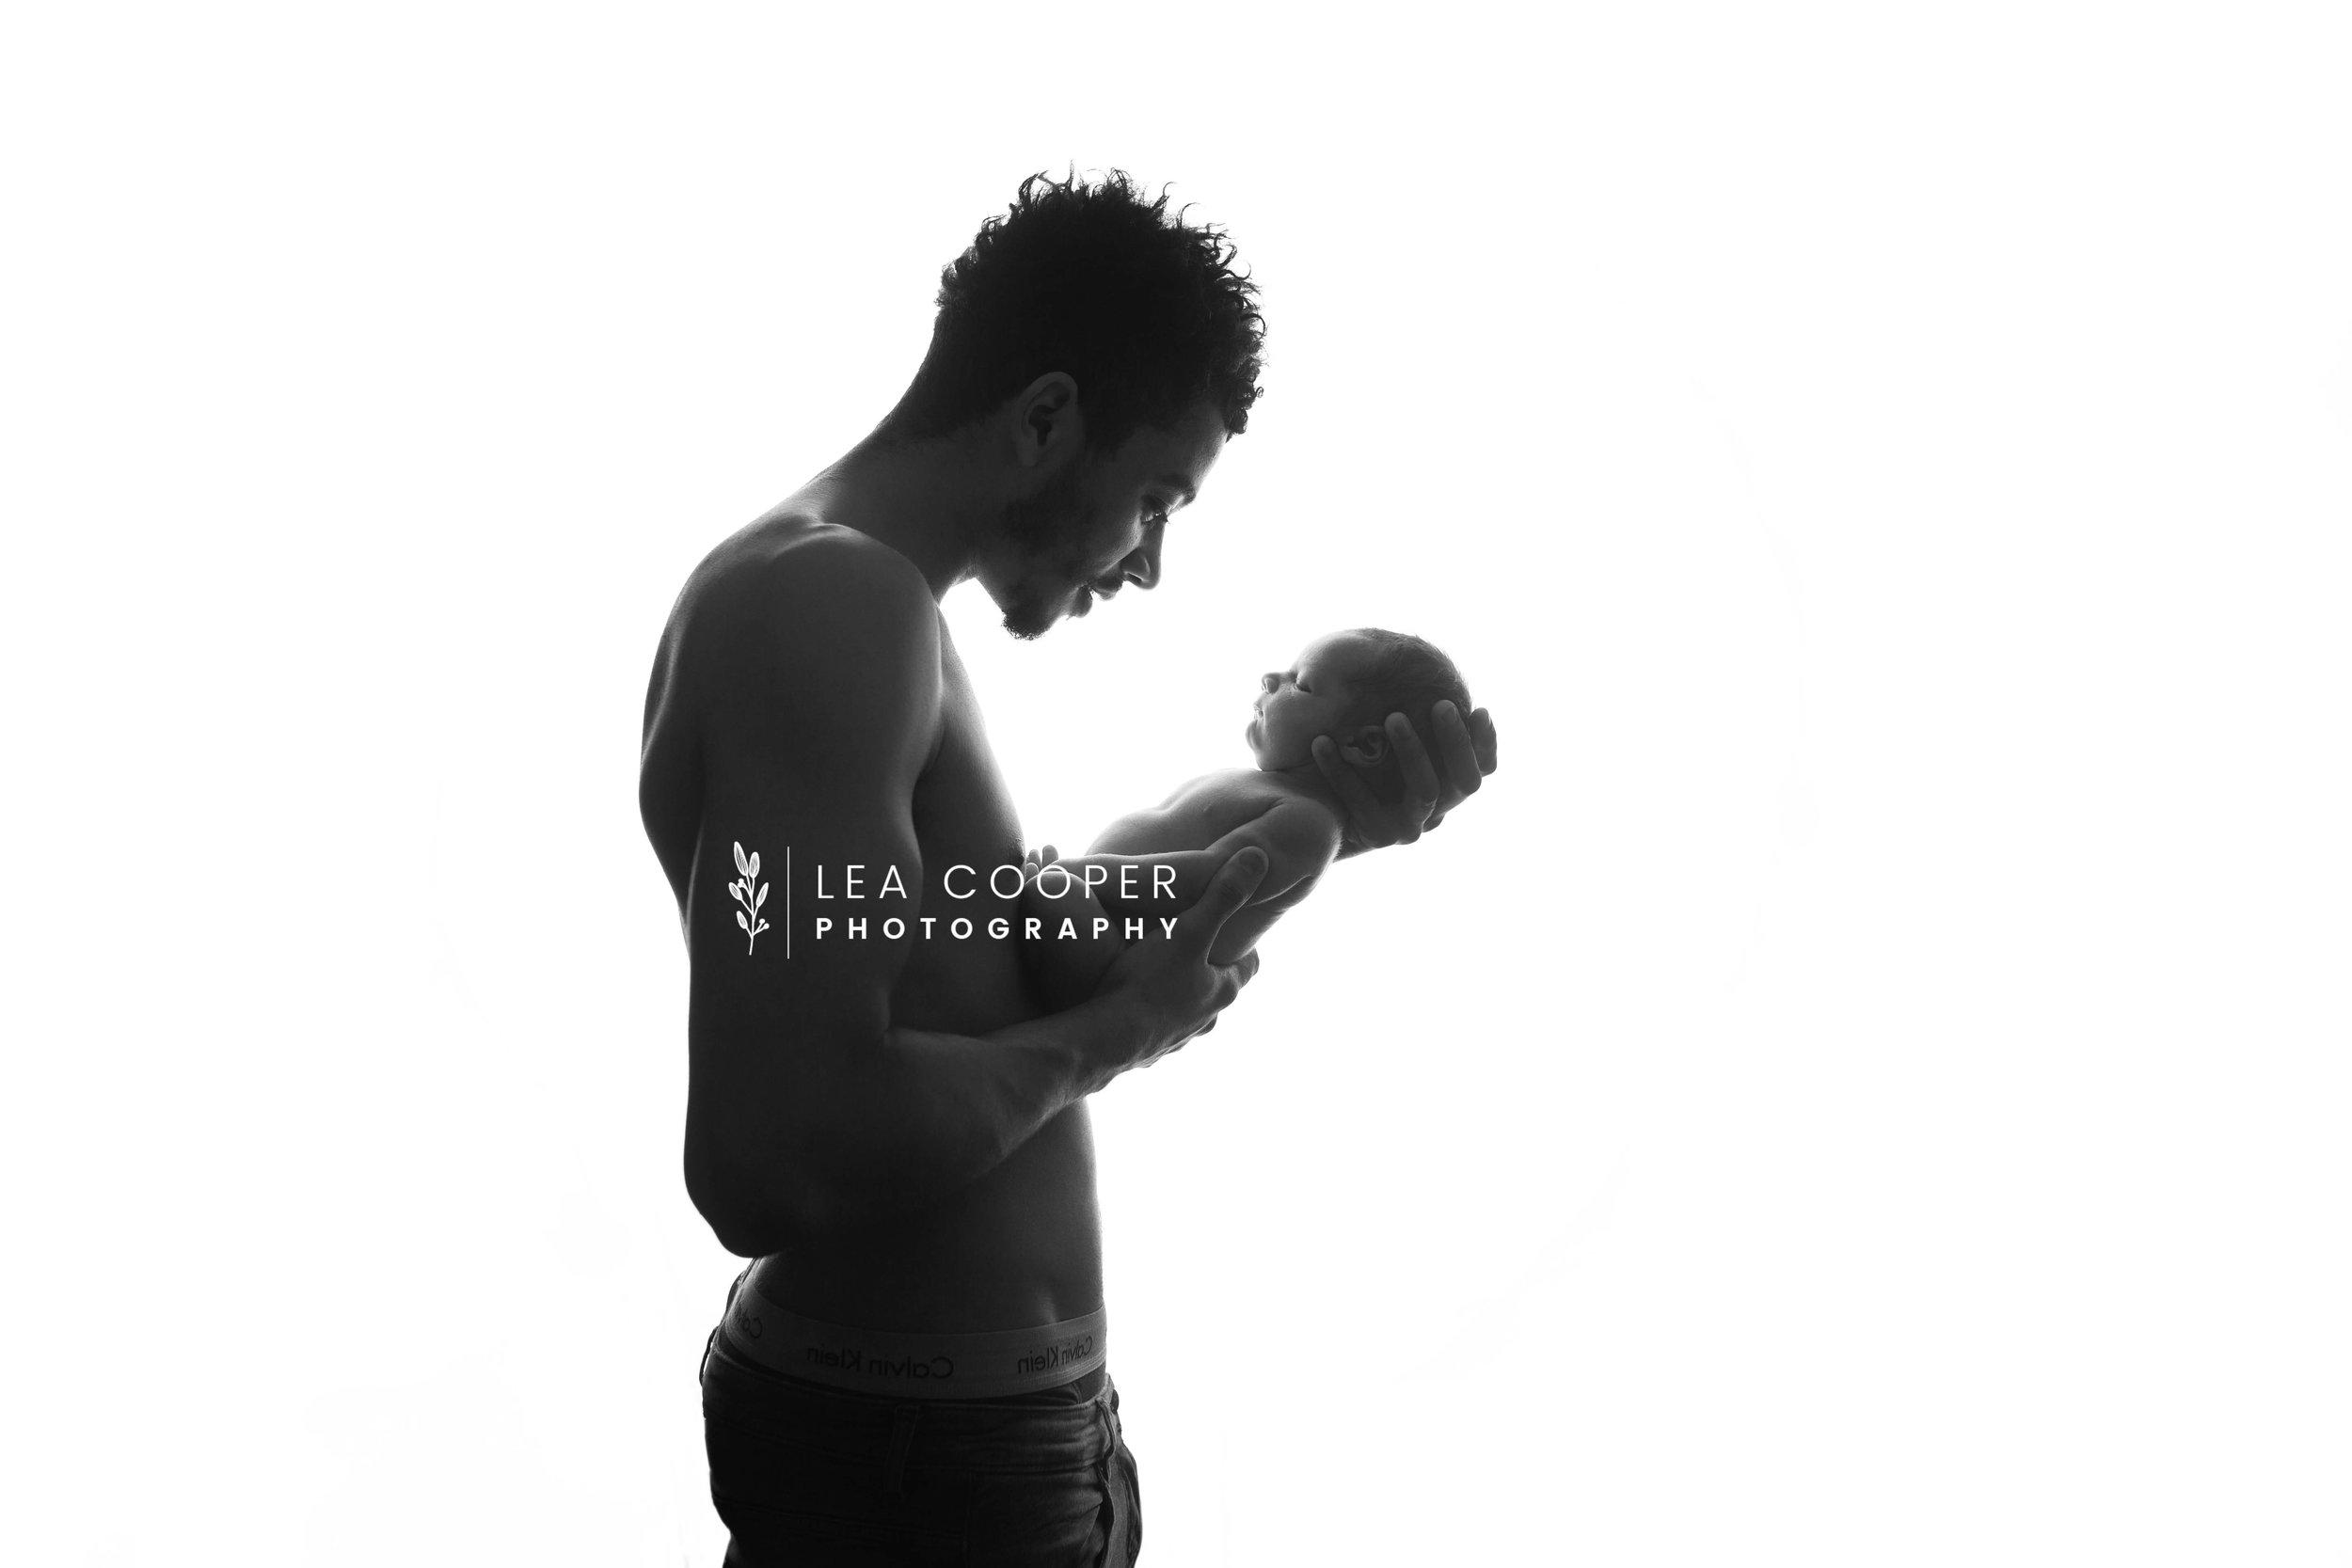 LEA COOPER PHOTOGRAPHY - NEWBORN PHOTOGRAPHY - NEWBORN PHOTOGRAPHY - BABY PHOTOGRAPHER - WILLENHALL - WEDNESBURY - WALSALL - WOLVERHAMPTON - FAMILY PHOTOGRAPHY - NEWBORN SESSION17.jpg